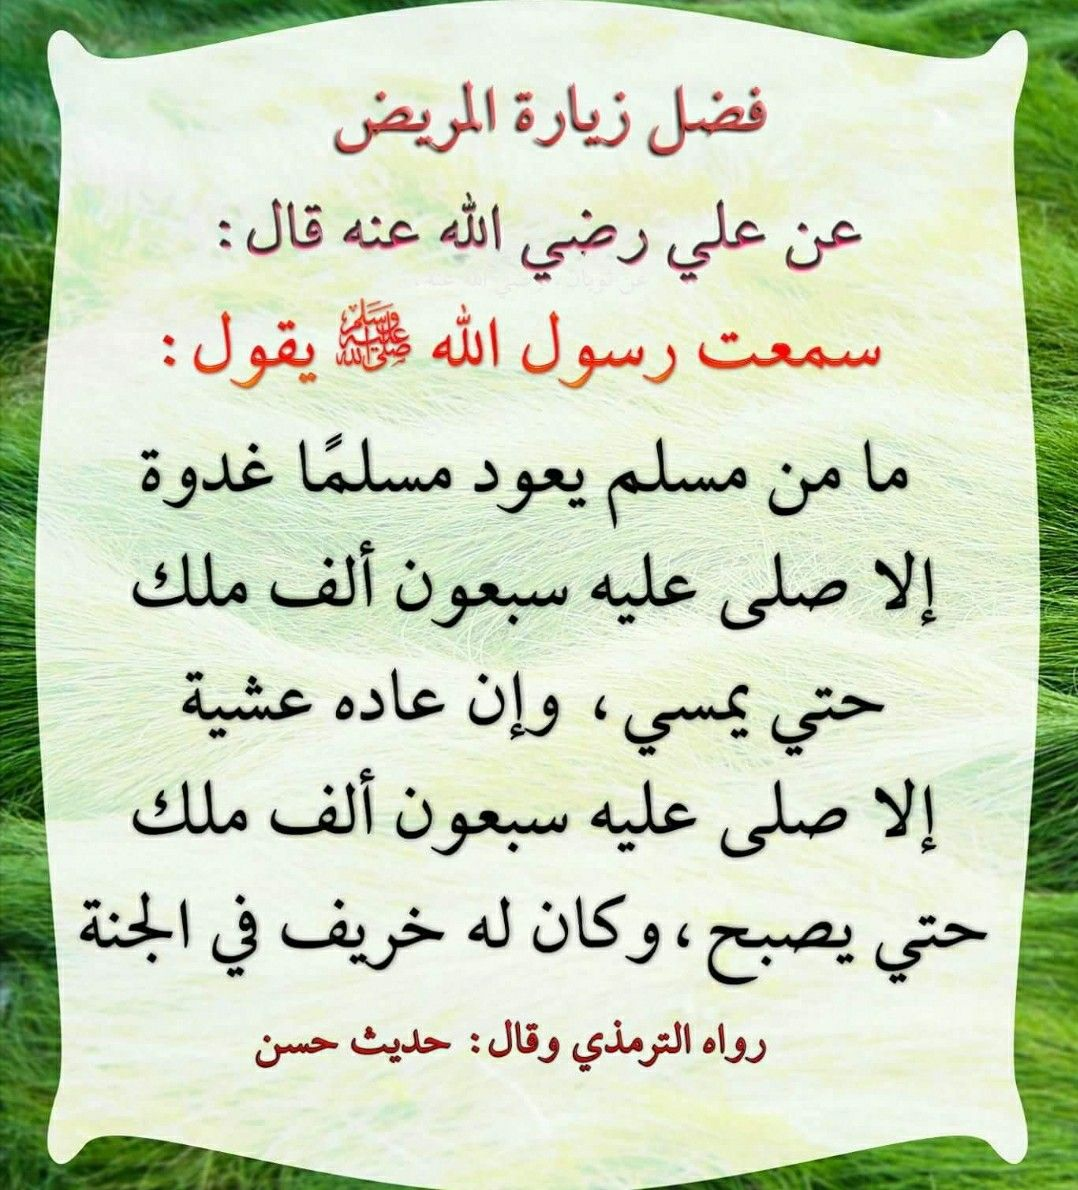 Pin By Nadjet Mihoubi On Faith ايمان Islam Hadith Calligraphy